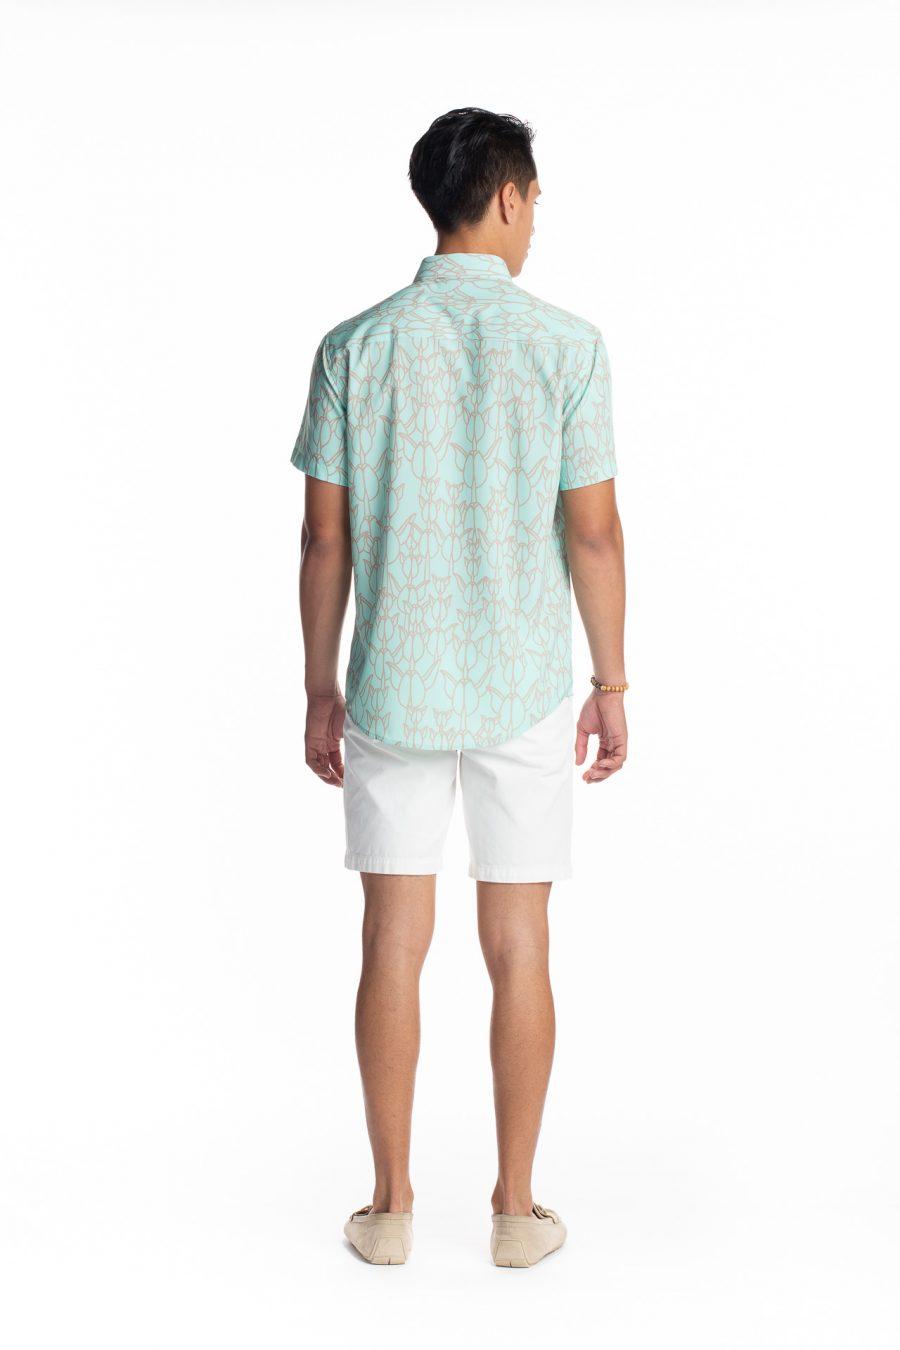 Male model wearing Hula Shirt S-S in Icy Moron/Cobblestone Kapualiko - Back View